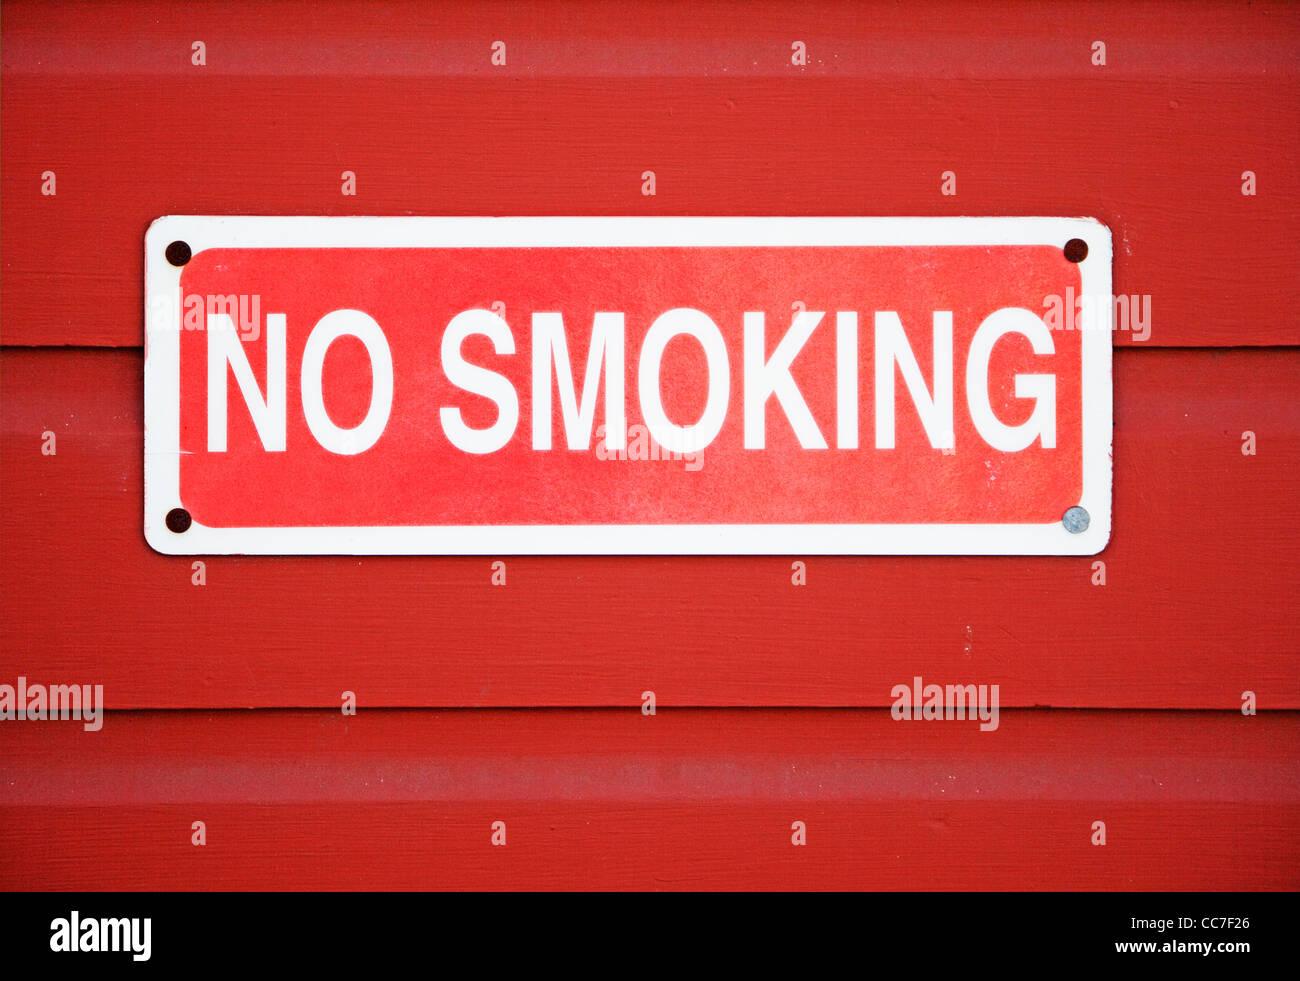 no smoking sign mounted on wall - Stock Image